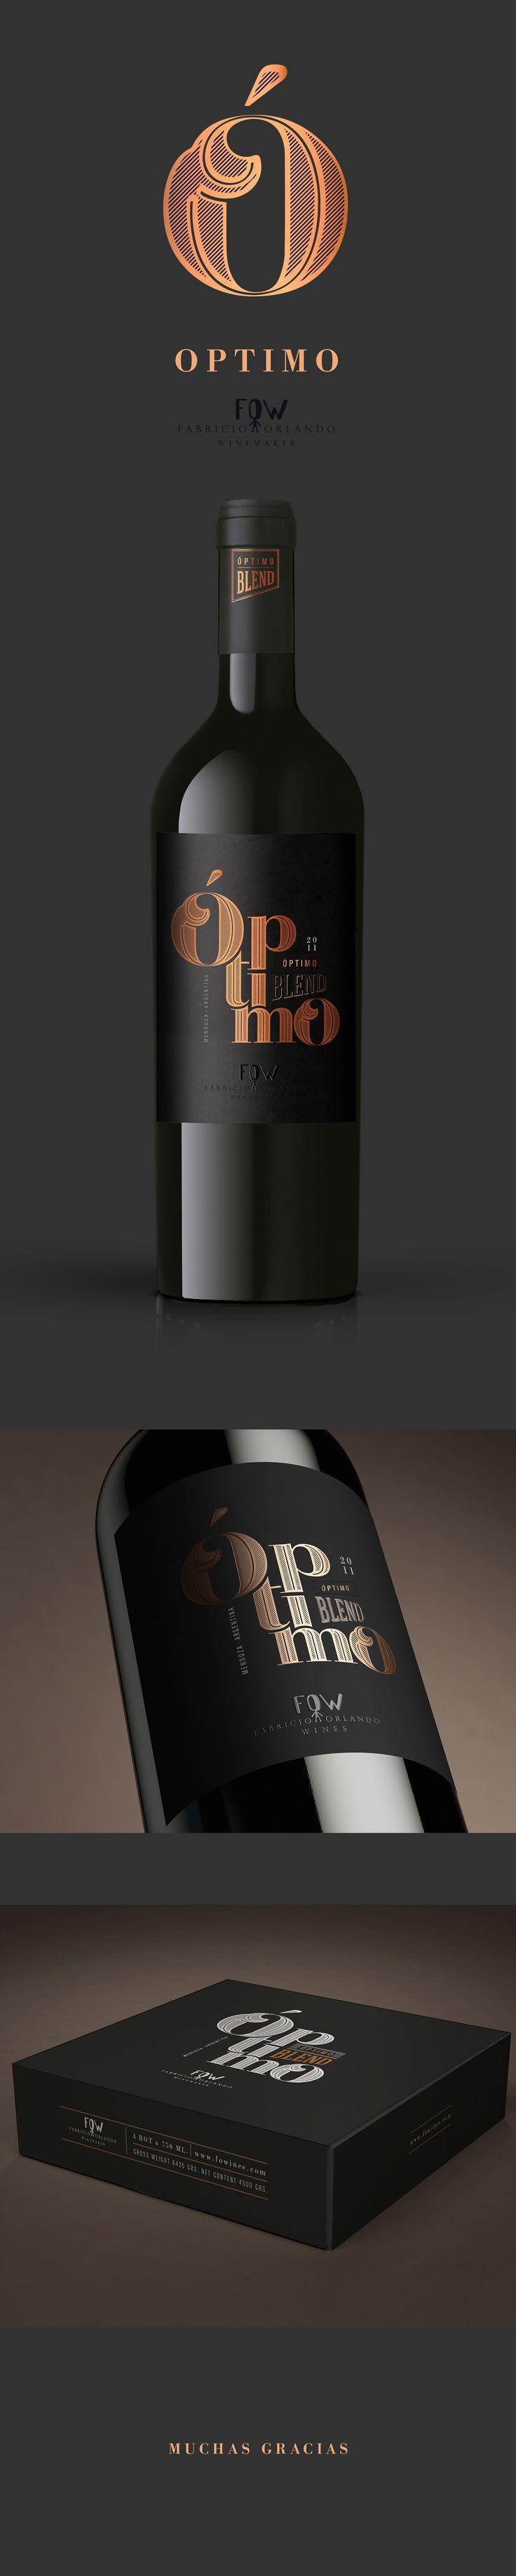 Óptimo · Fabricio Orlando Winemaker on Behance #wine #packaging